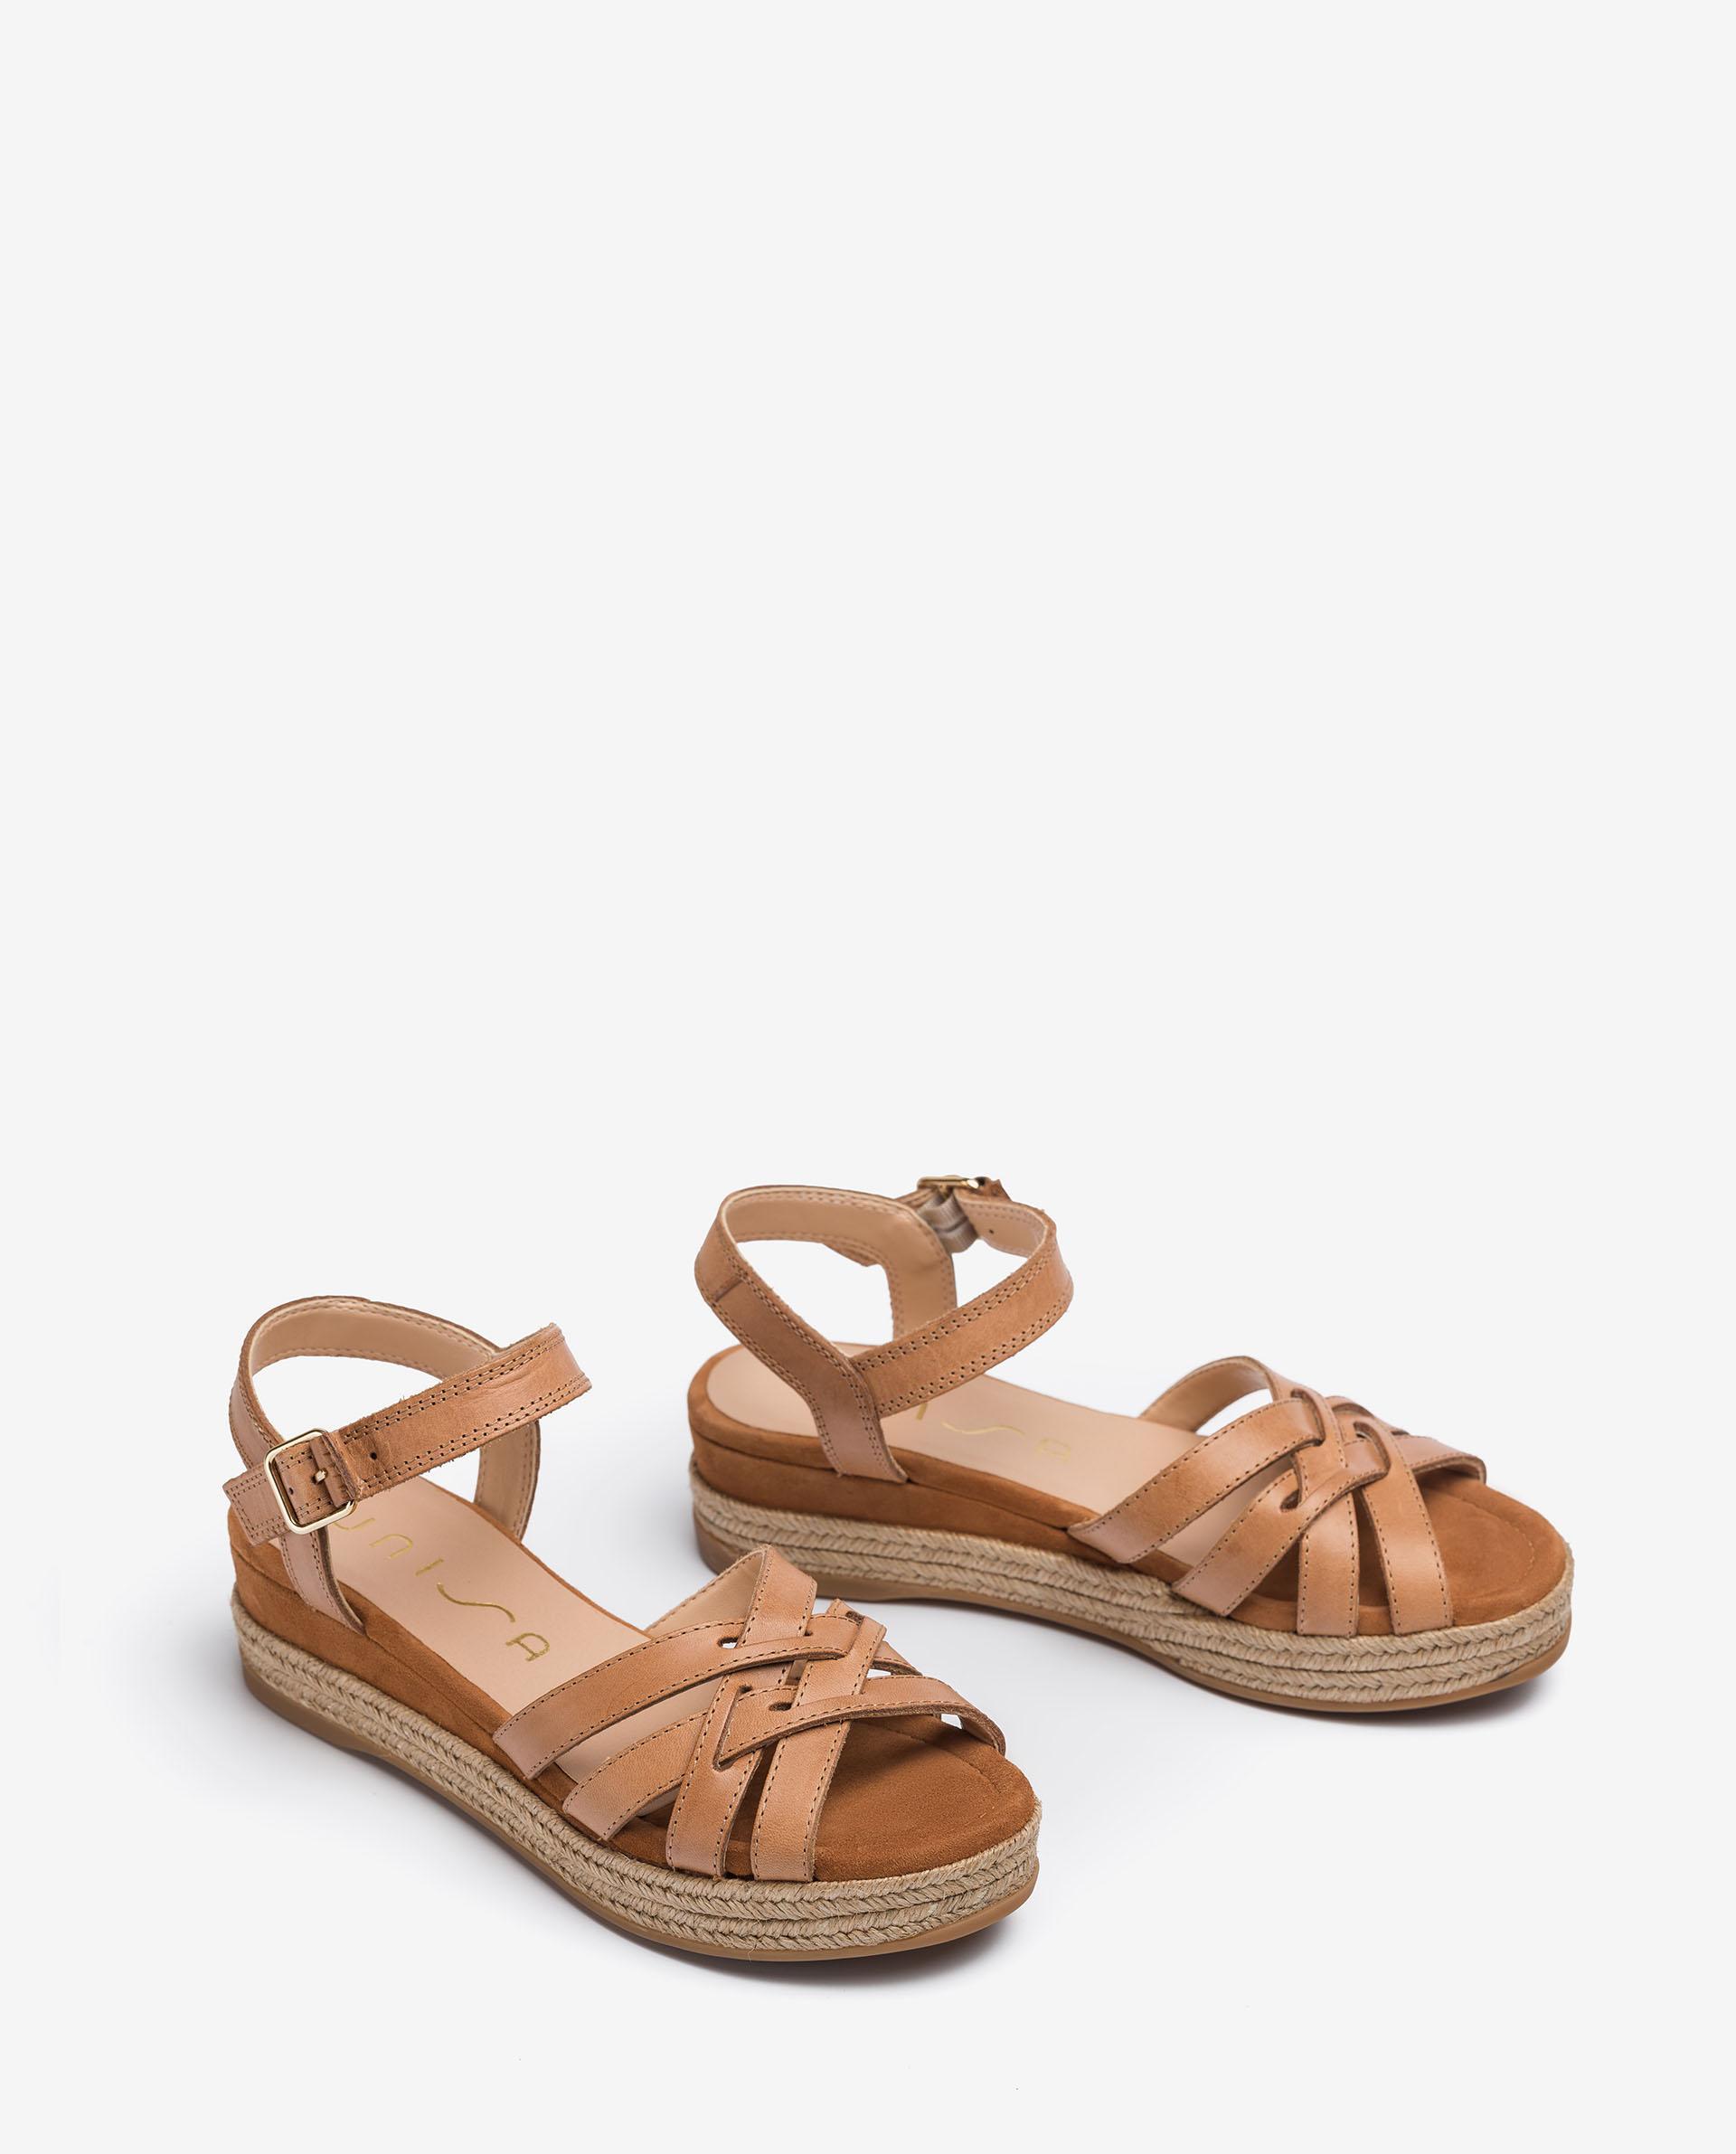 UNISA Contrast leather sandals GALDAR_RAN 2